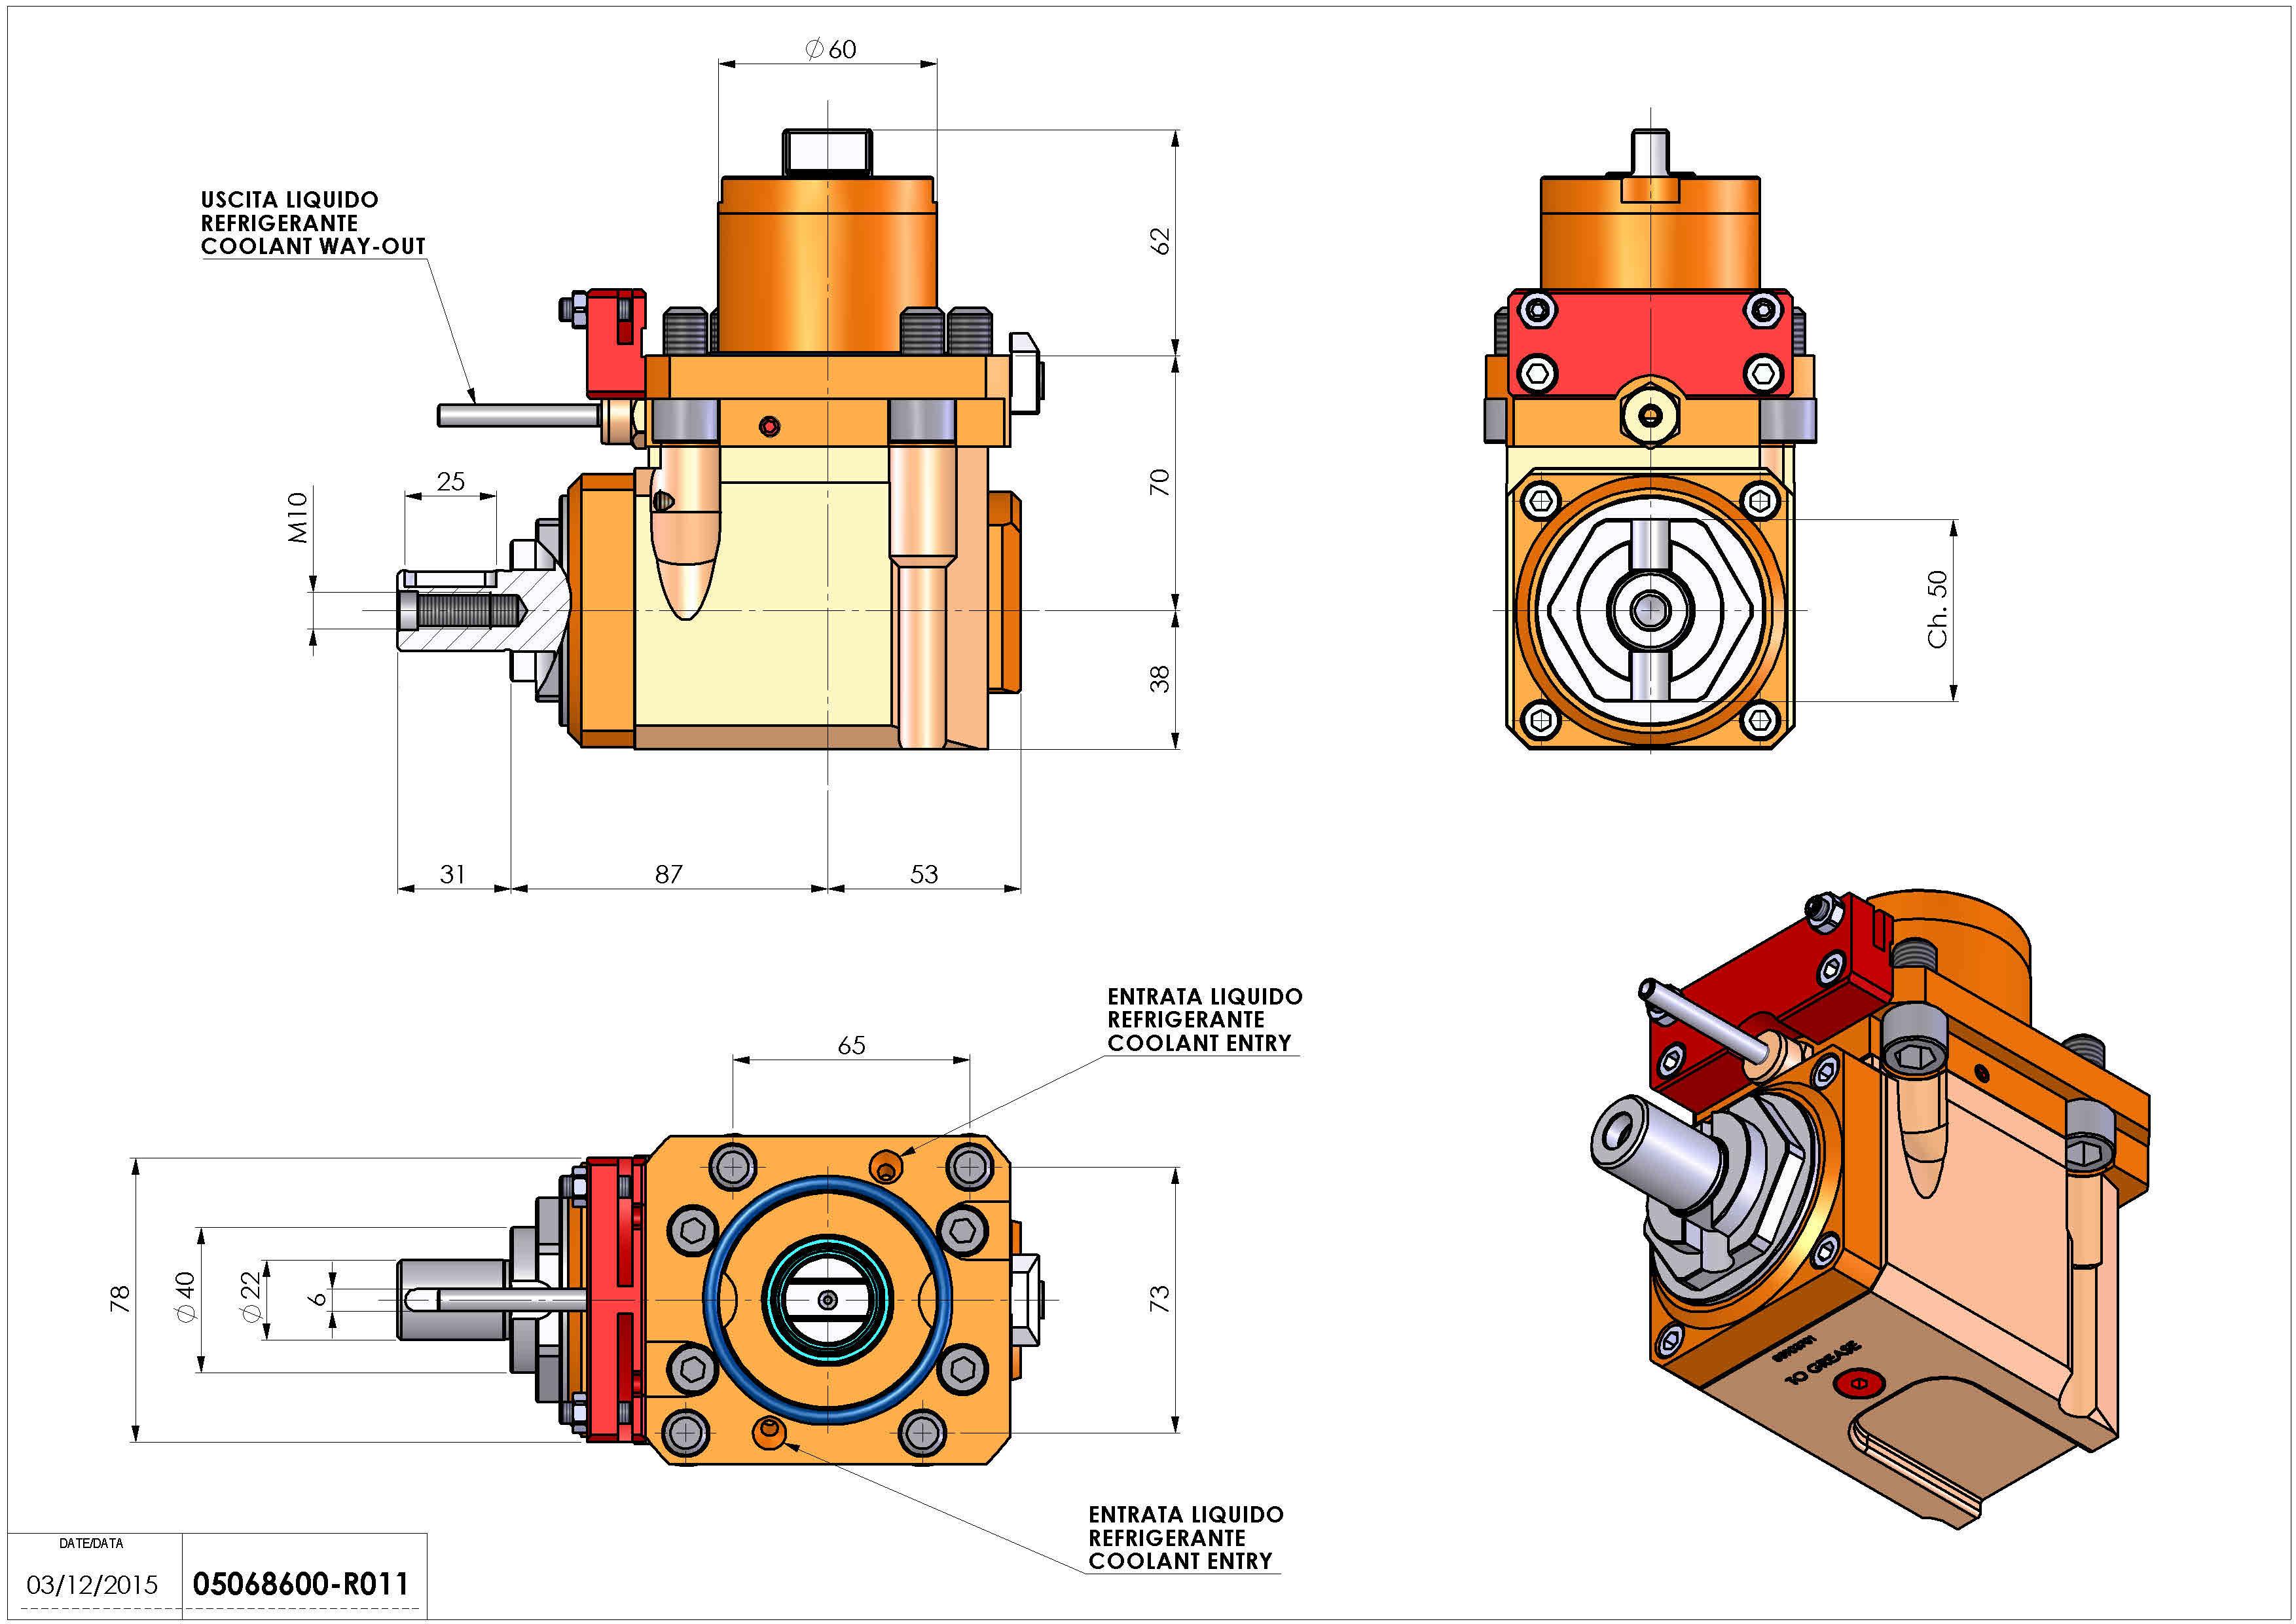 Technical image - LT-A D60 DIN138-22 H70 OK.